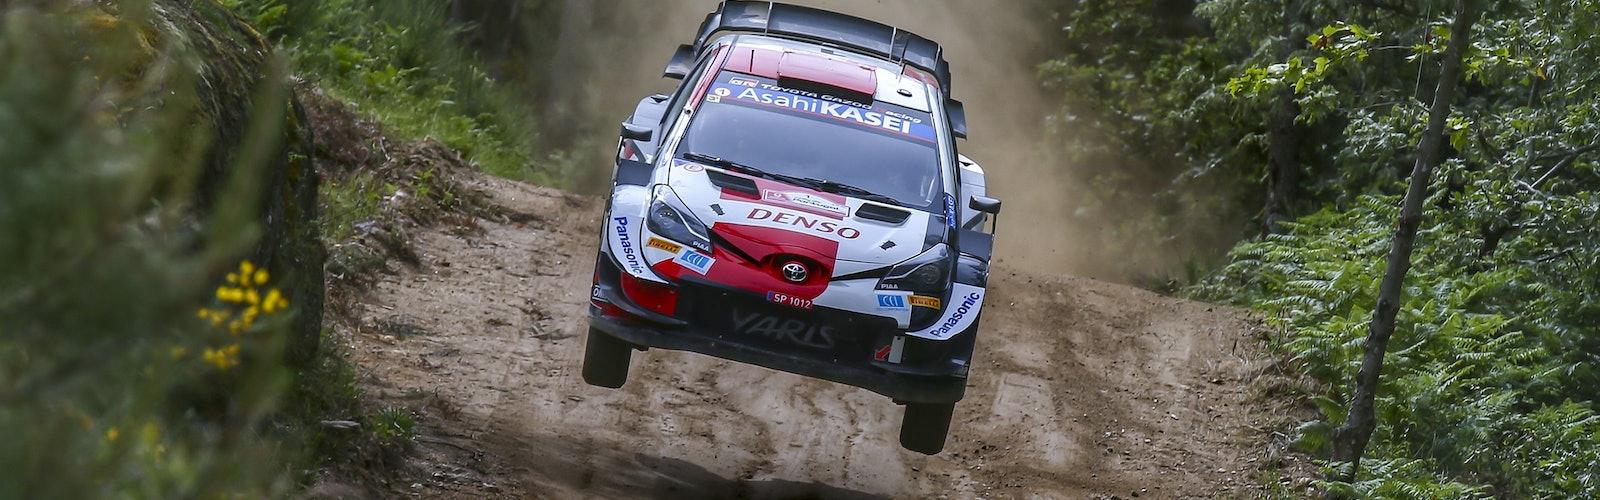 WRC_2021_Rd.4_198